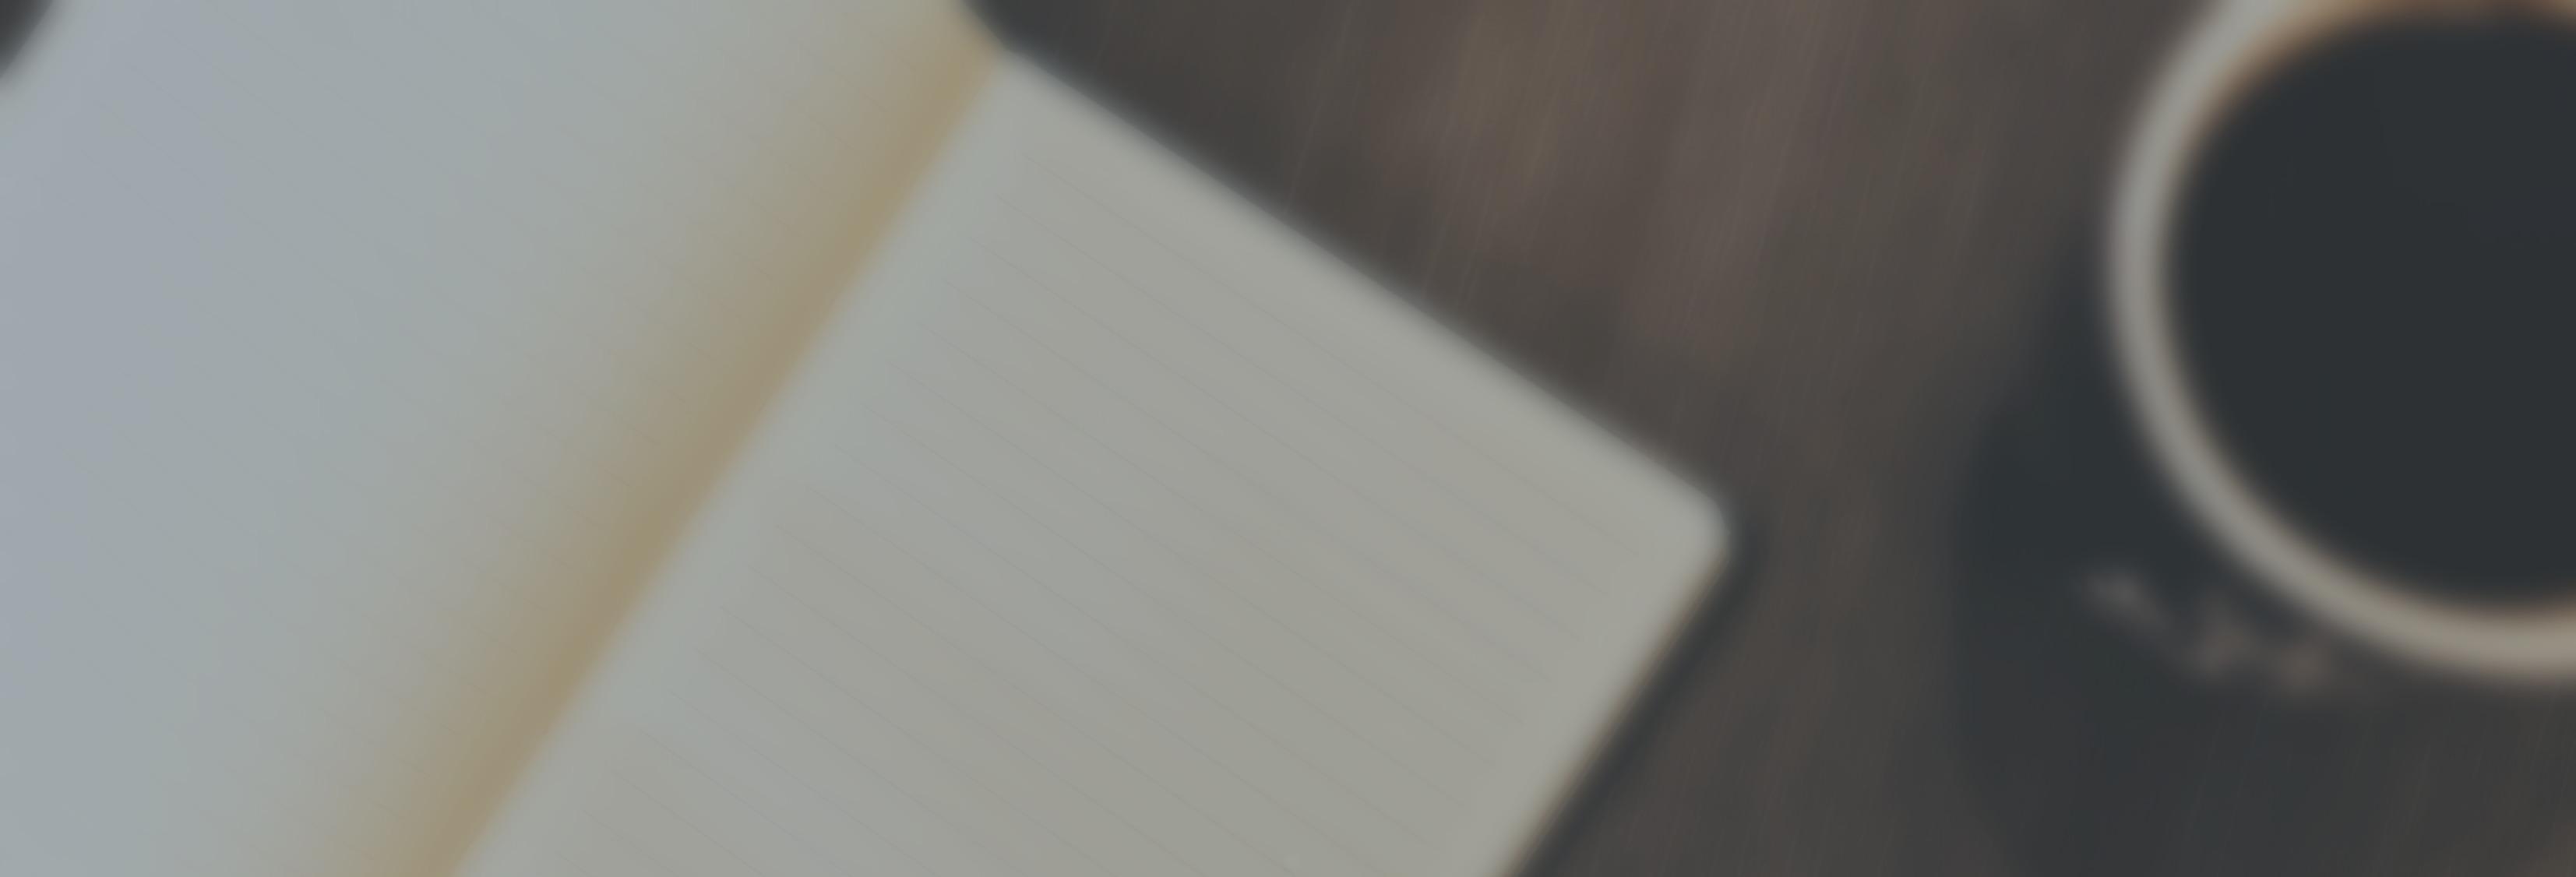 coffee_and_notebook_crop-1.jpg